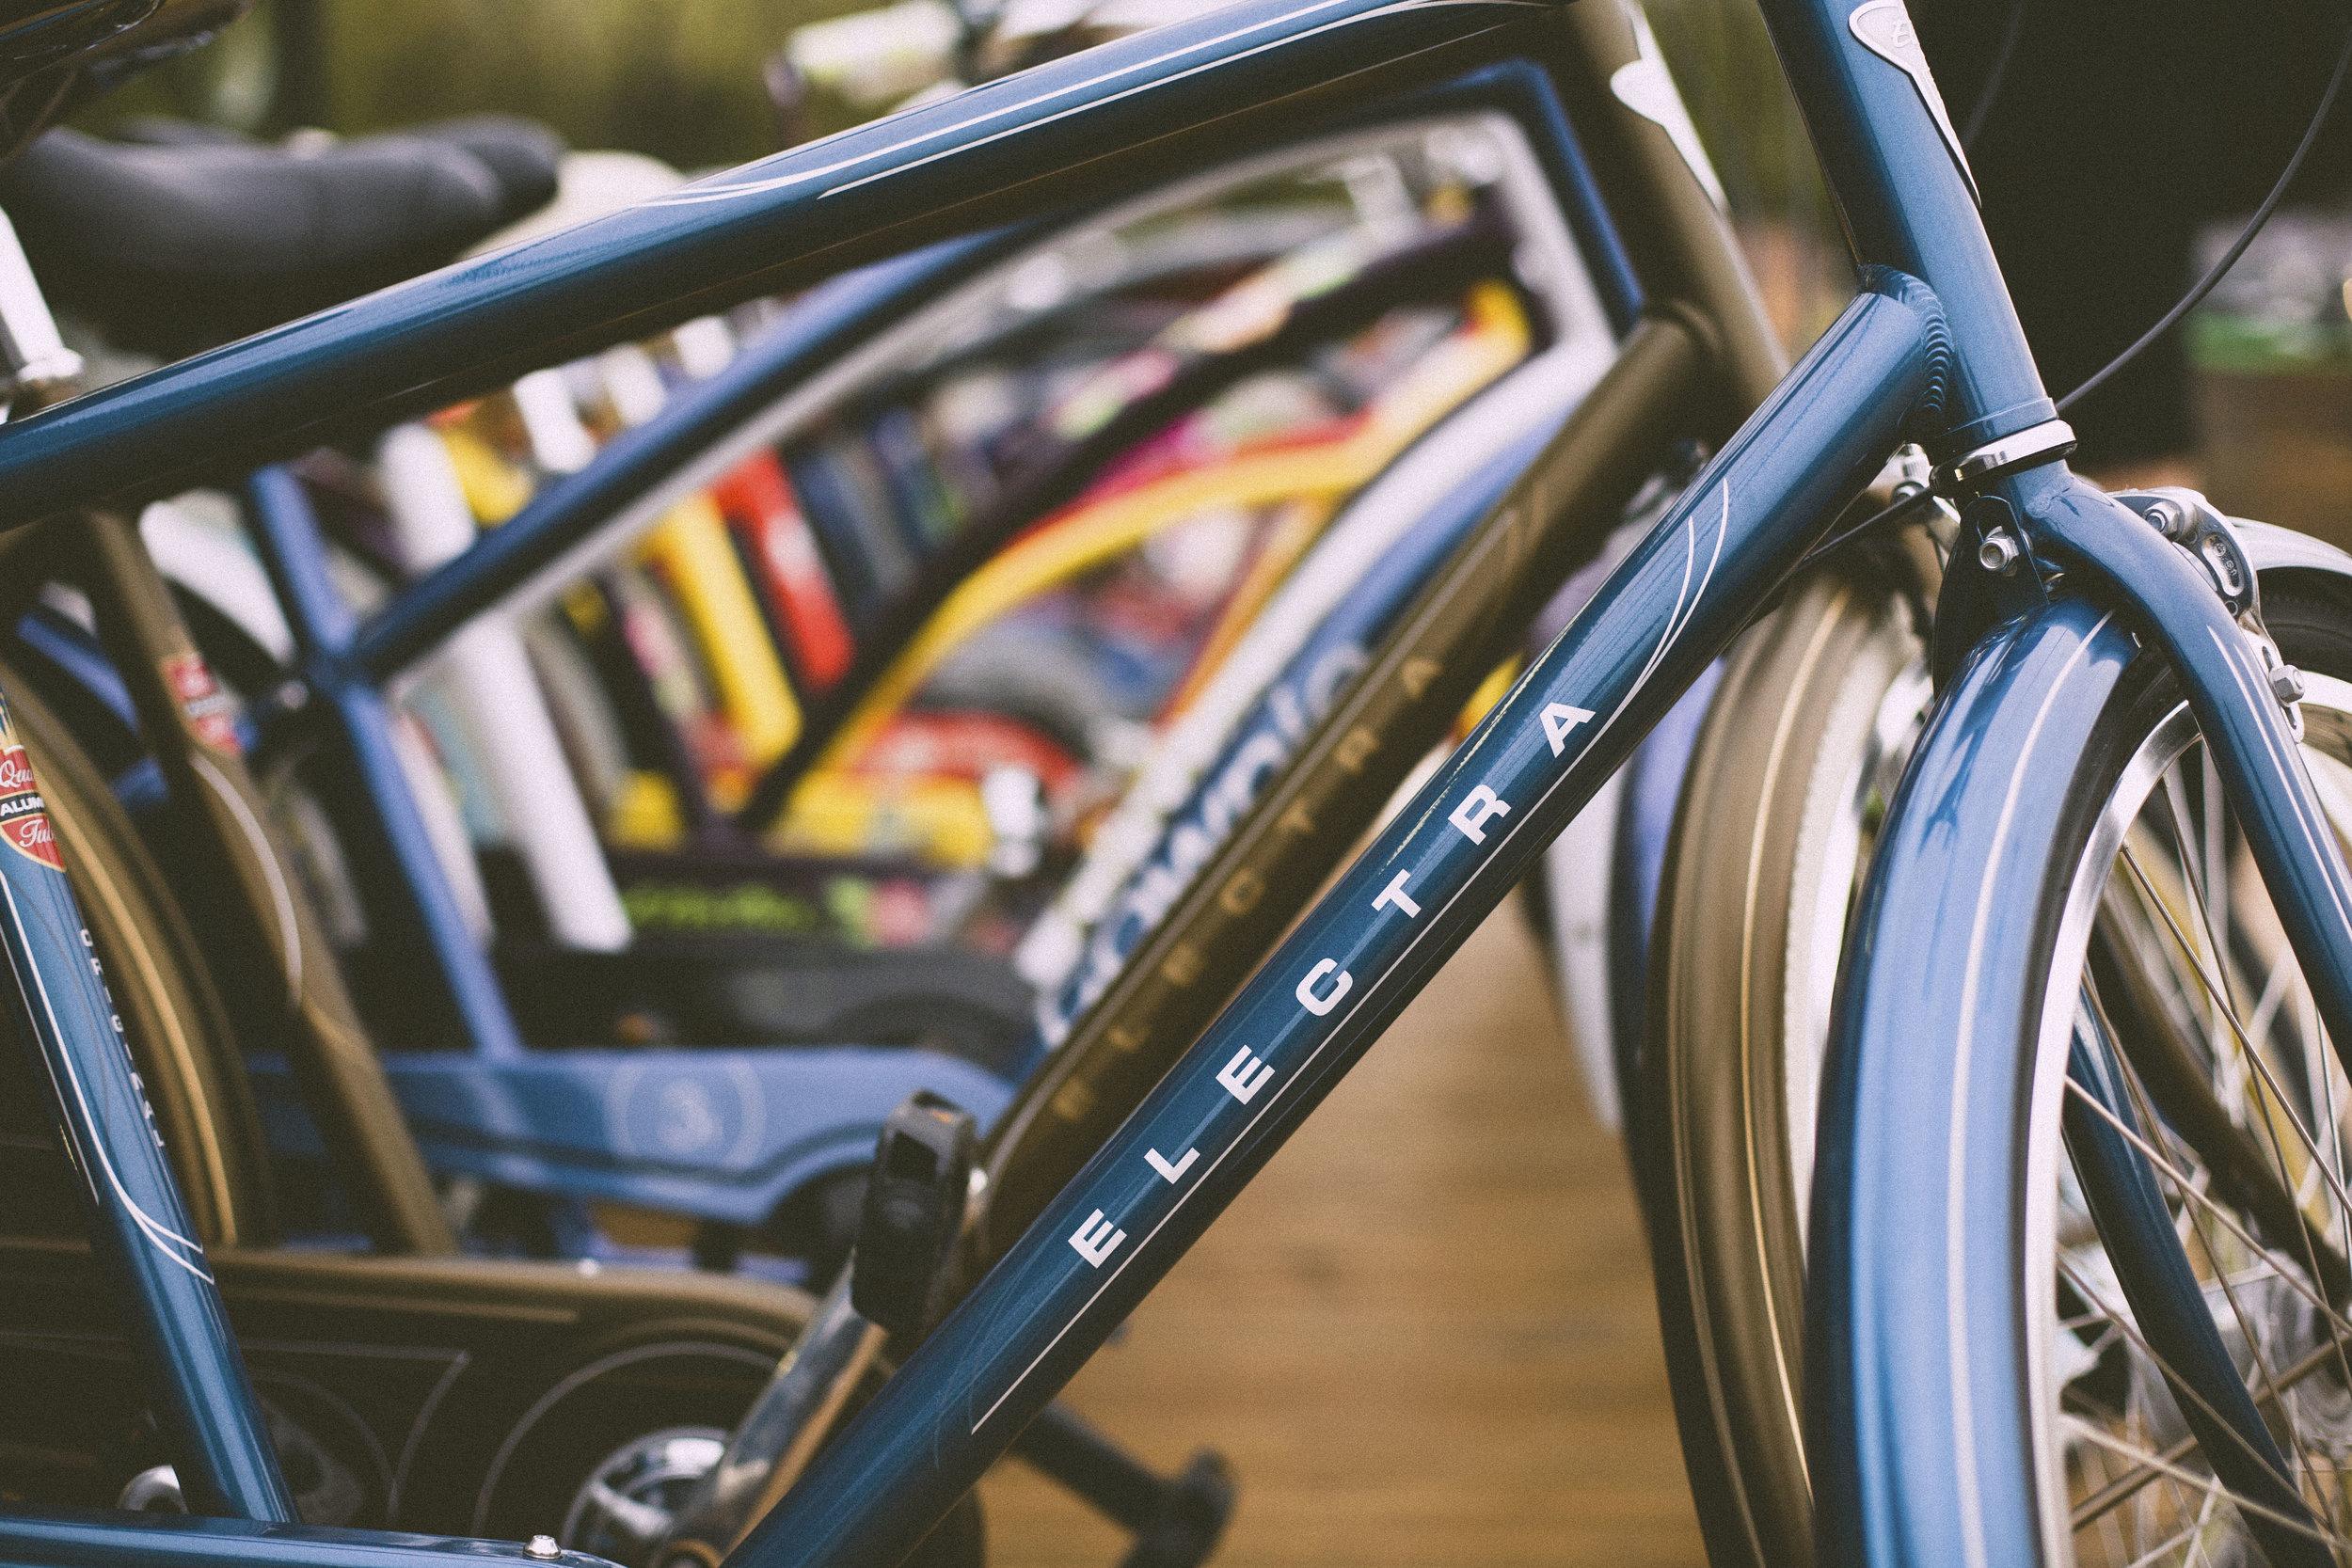 lotsa-bikes-StockSnap_I7636GC9V2.jpg